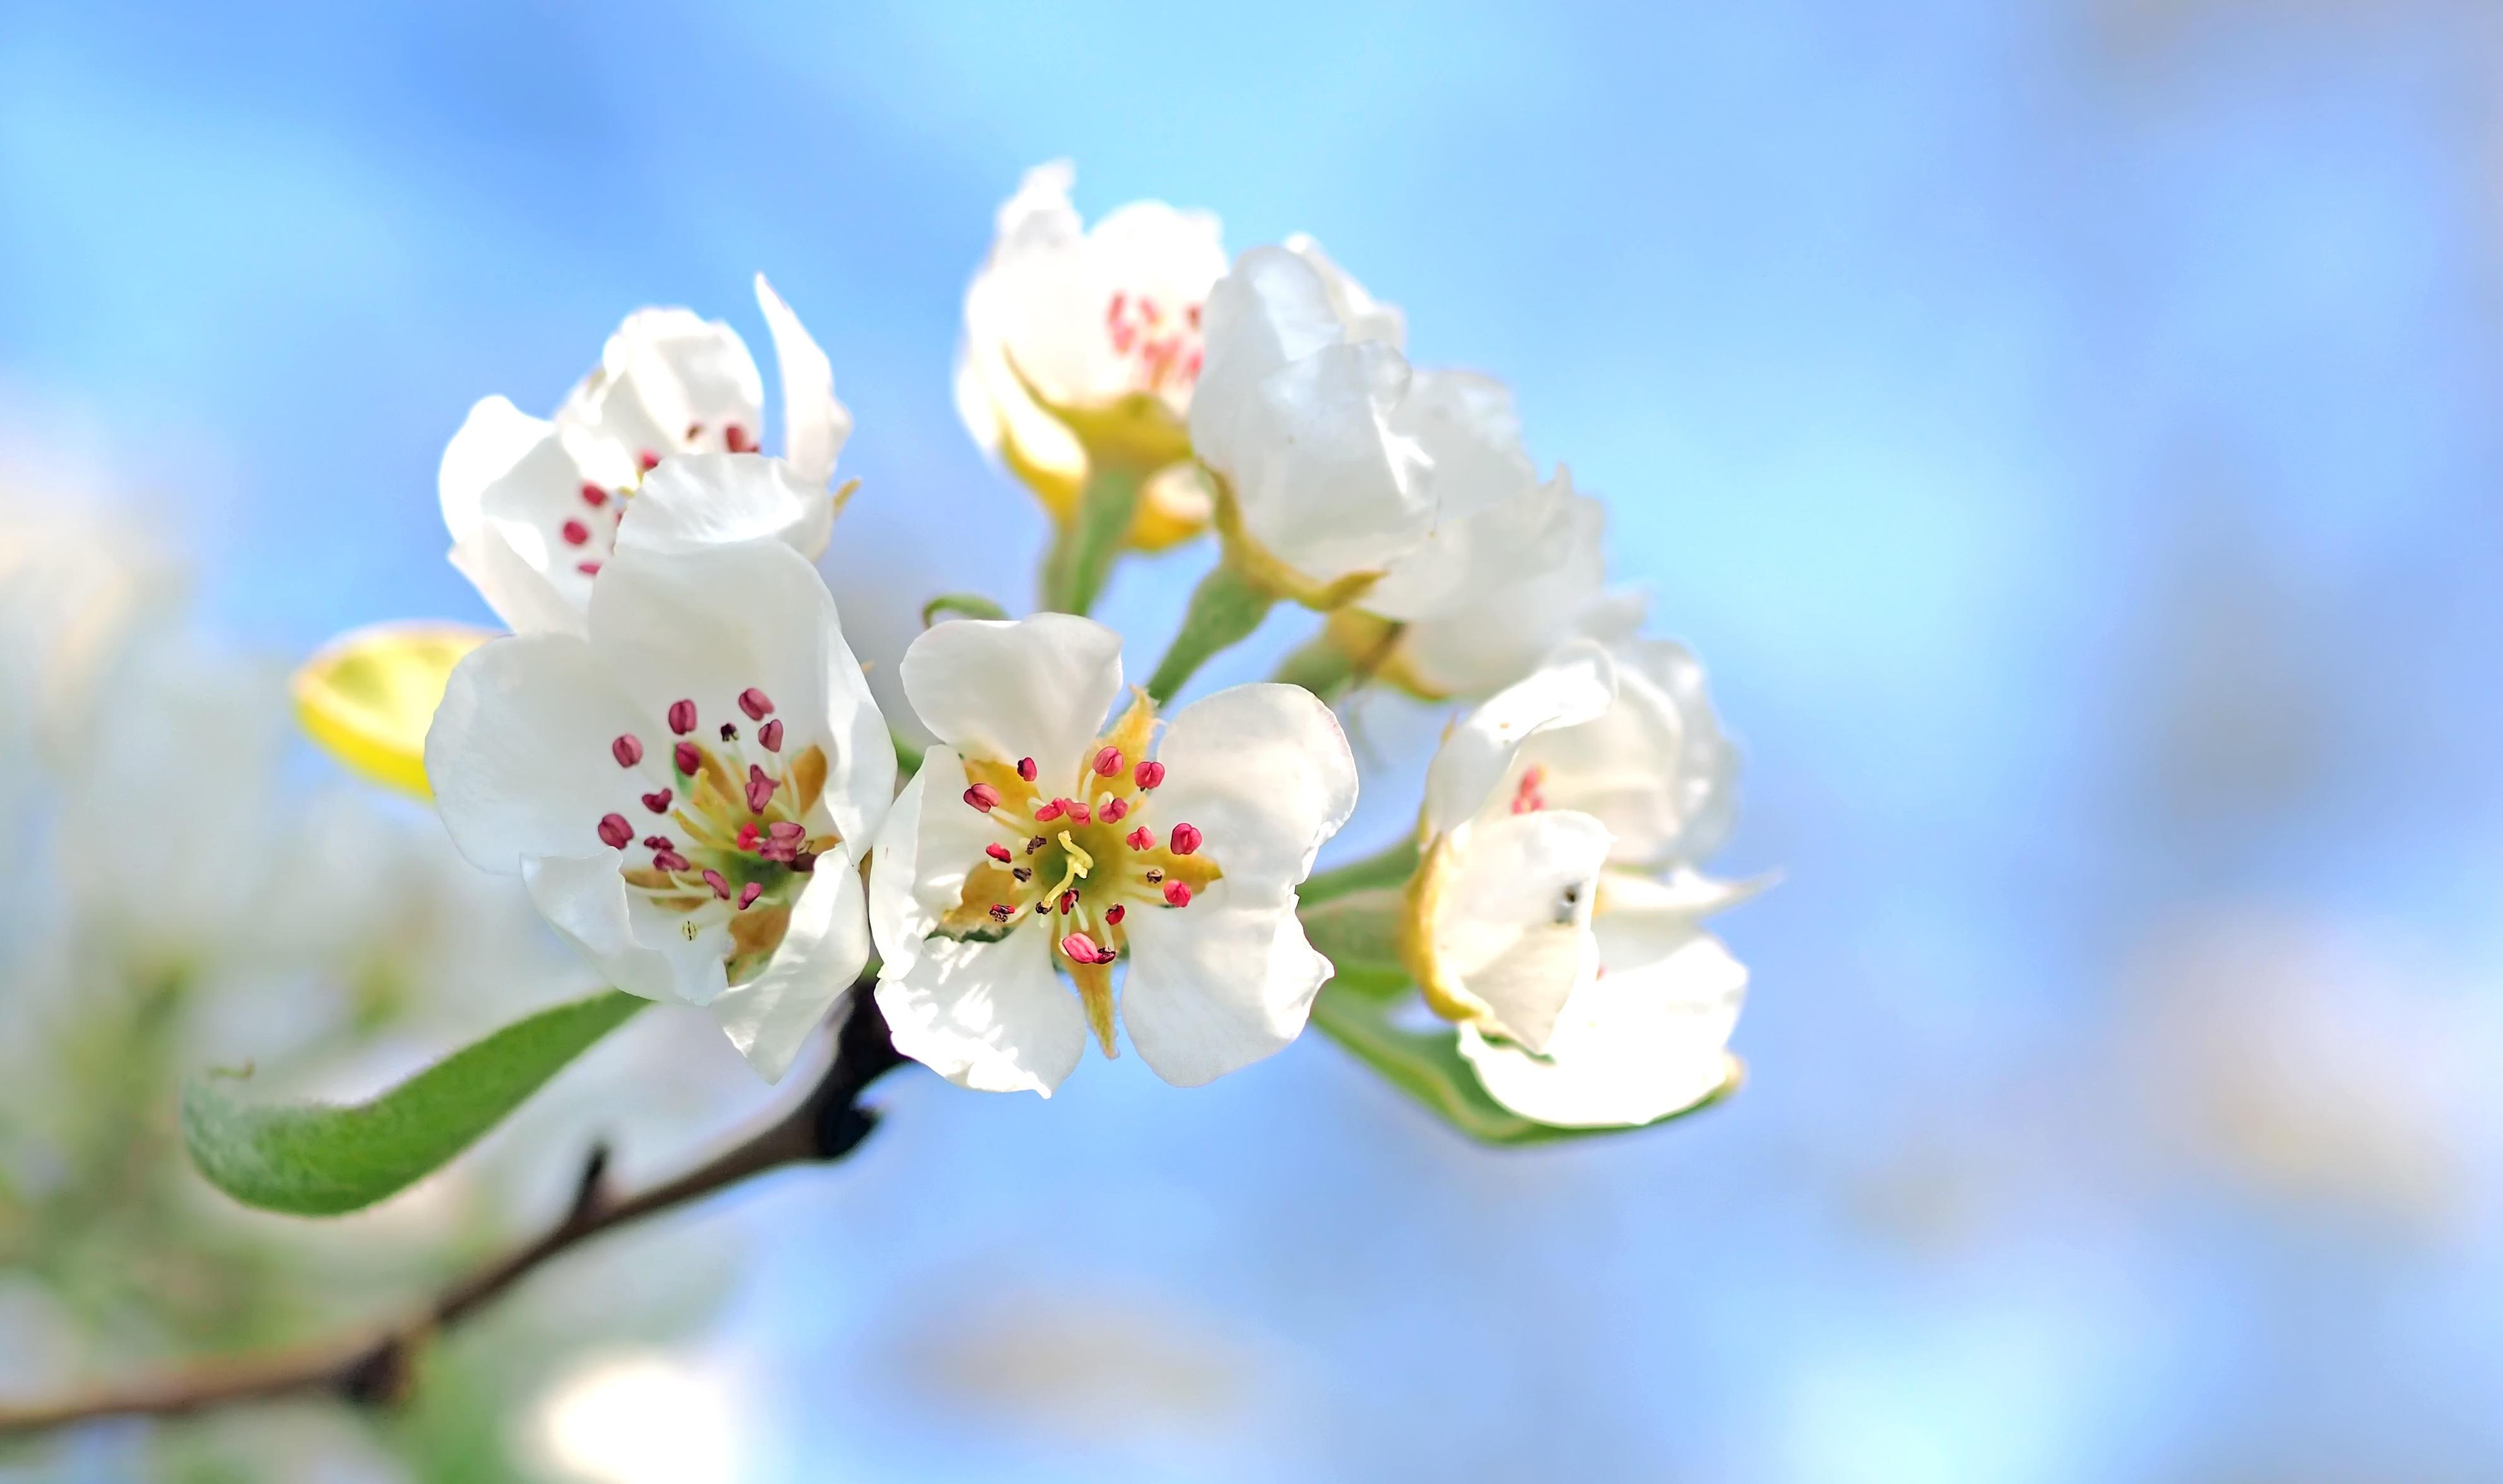 Free Images : nature, branch, blur, growth, fruit, leaf, petal ...